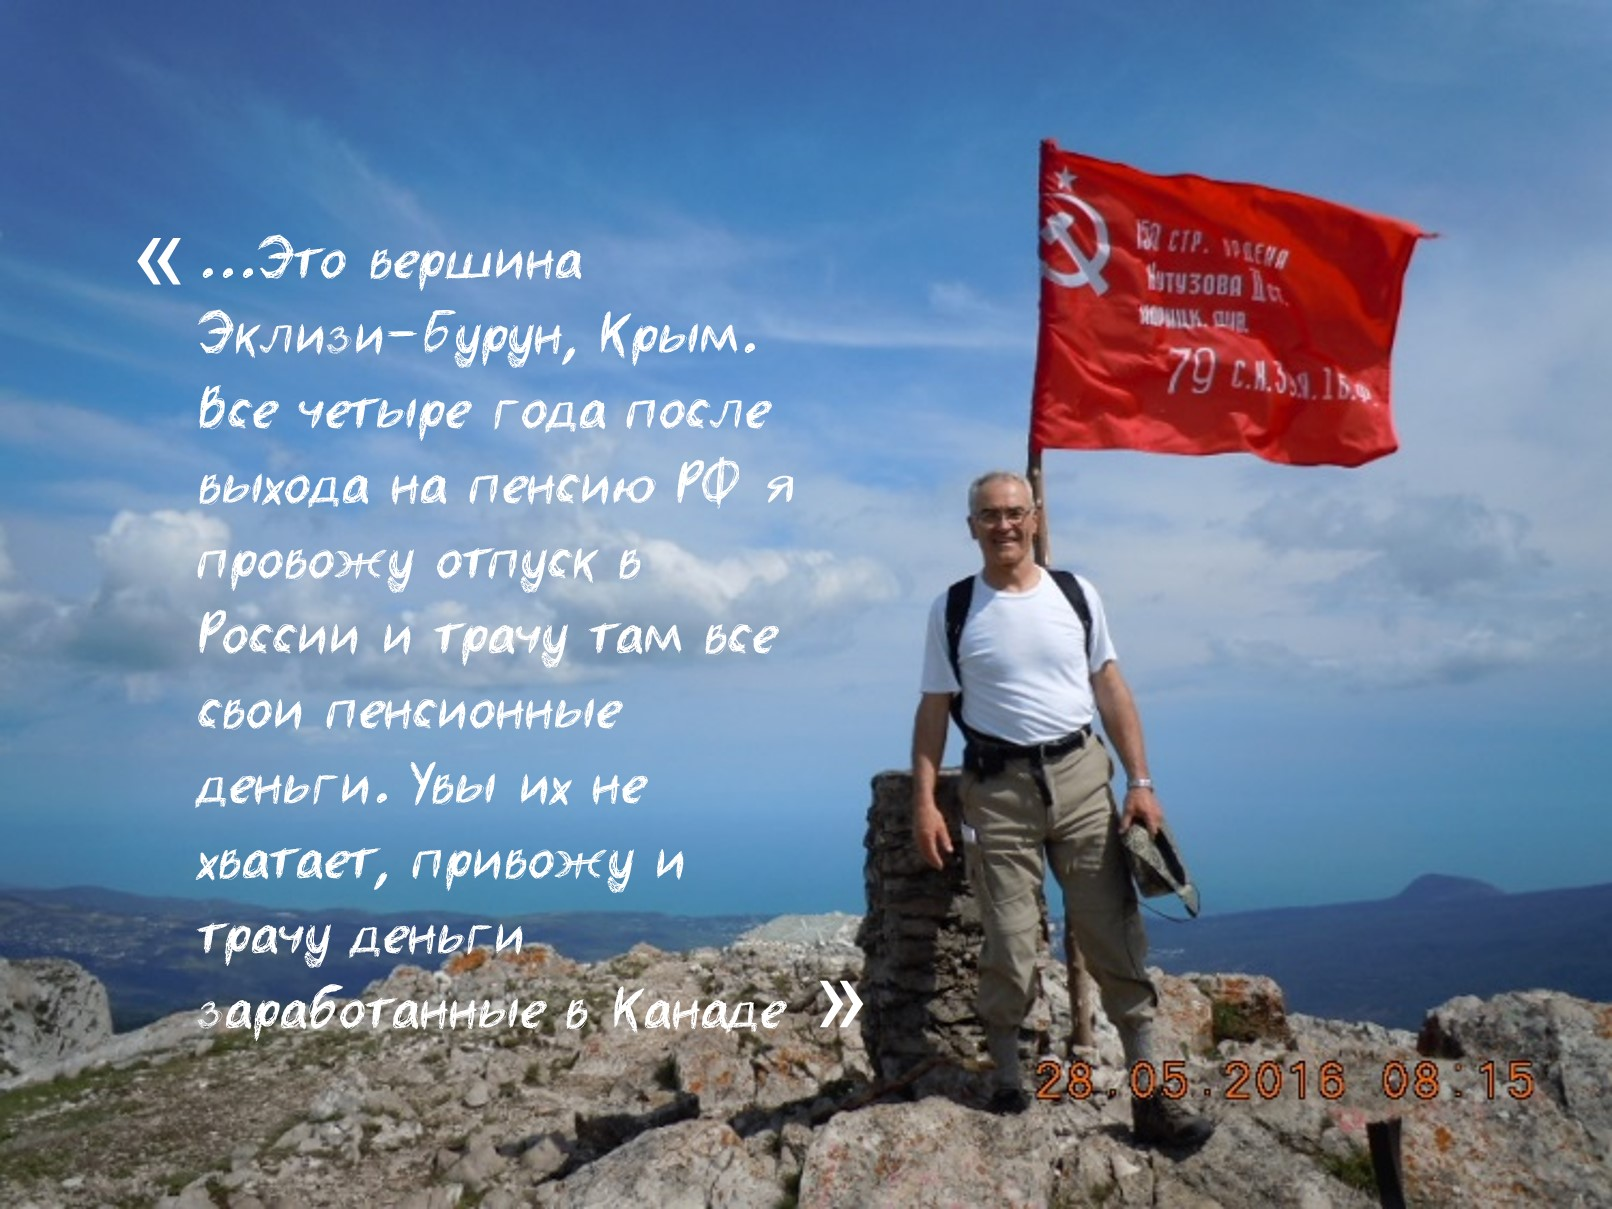 владимир буйлов 1 https://grosh-blog.ru